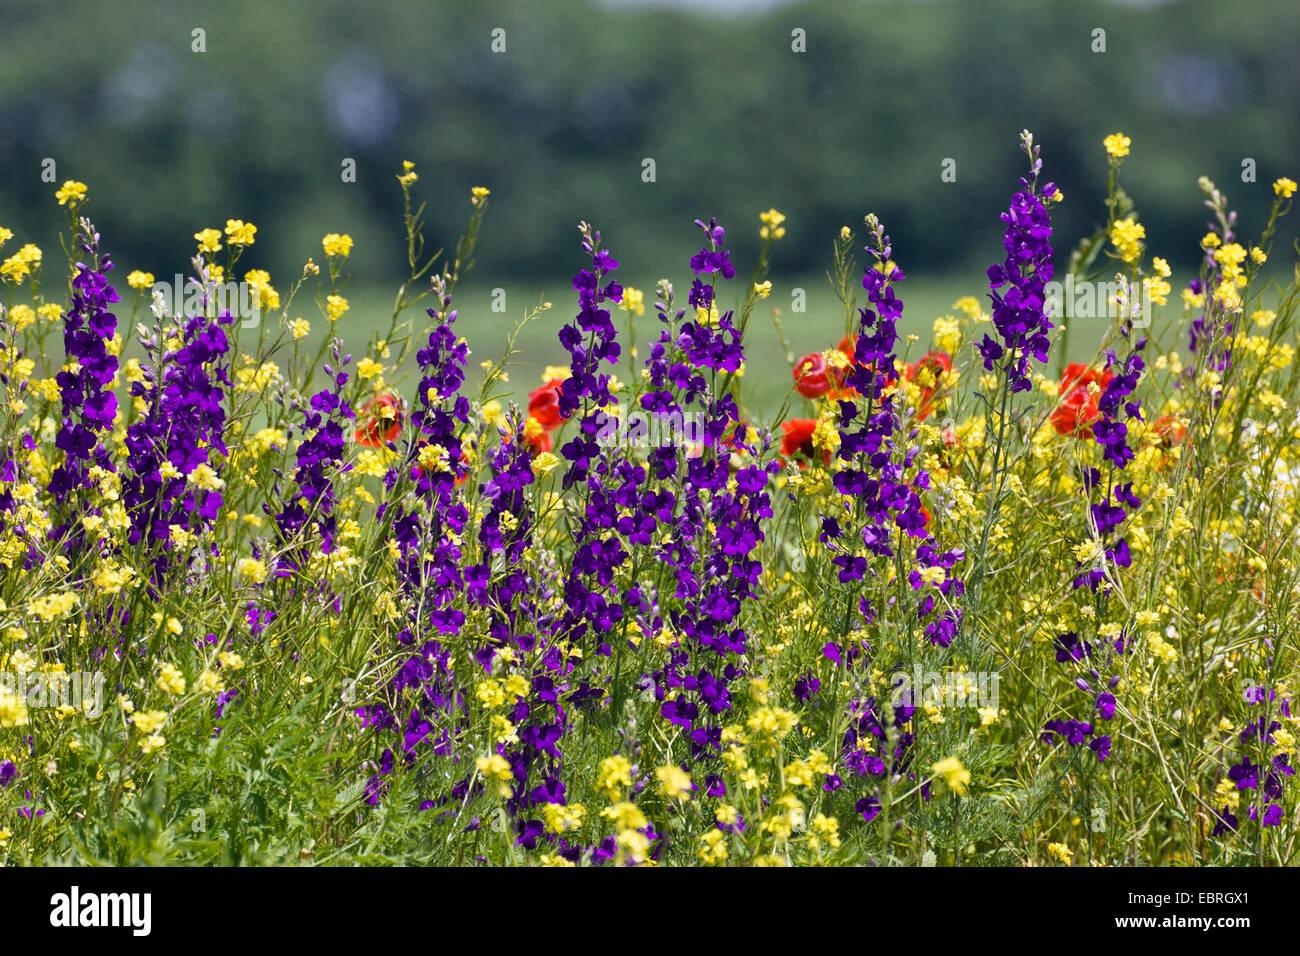 Doubtful knight's-spur, Larkspur, Annual Delphinium (Consolida ajacis, Delphinium ajacis), flowering meadow - Stock Image